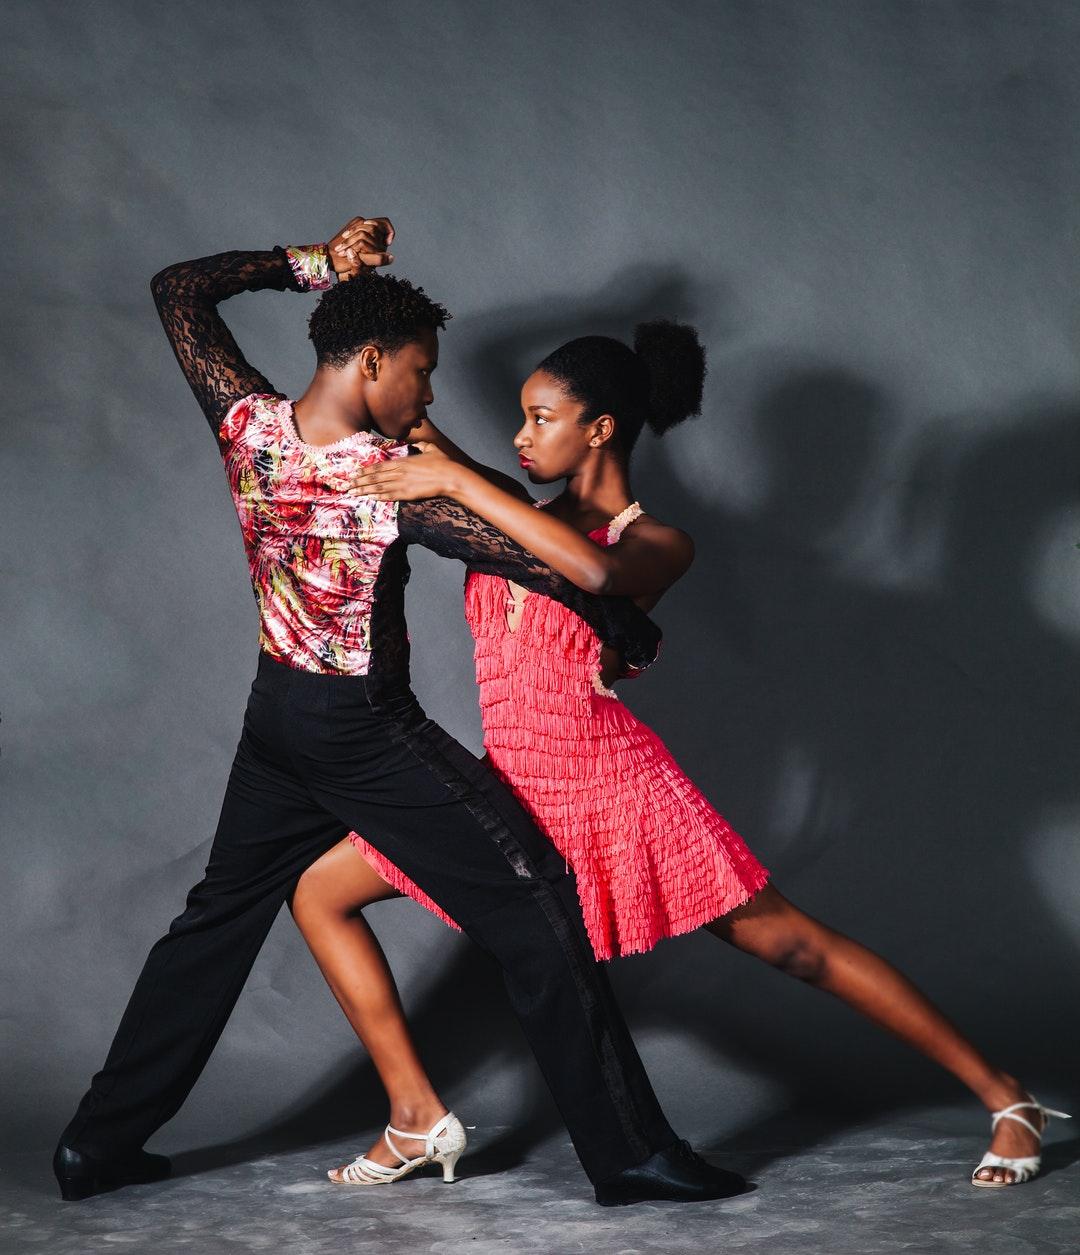 10 Best Salsa Dance Shoes Reviewed